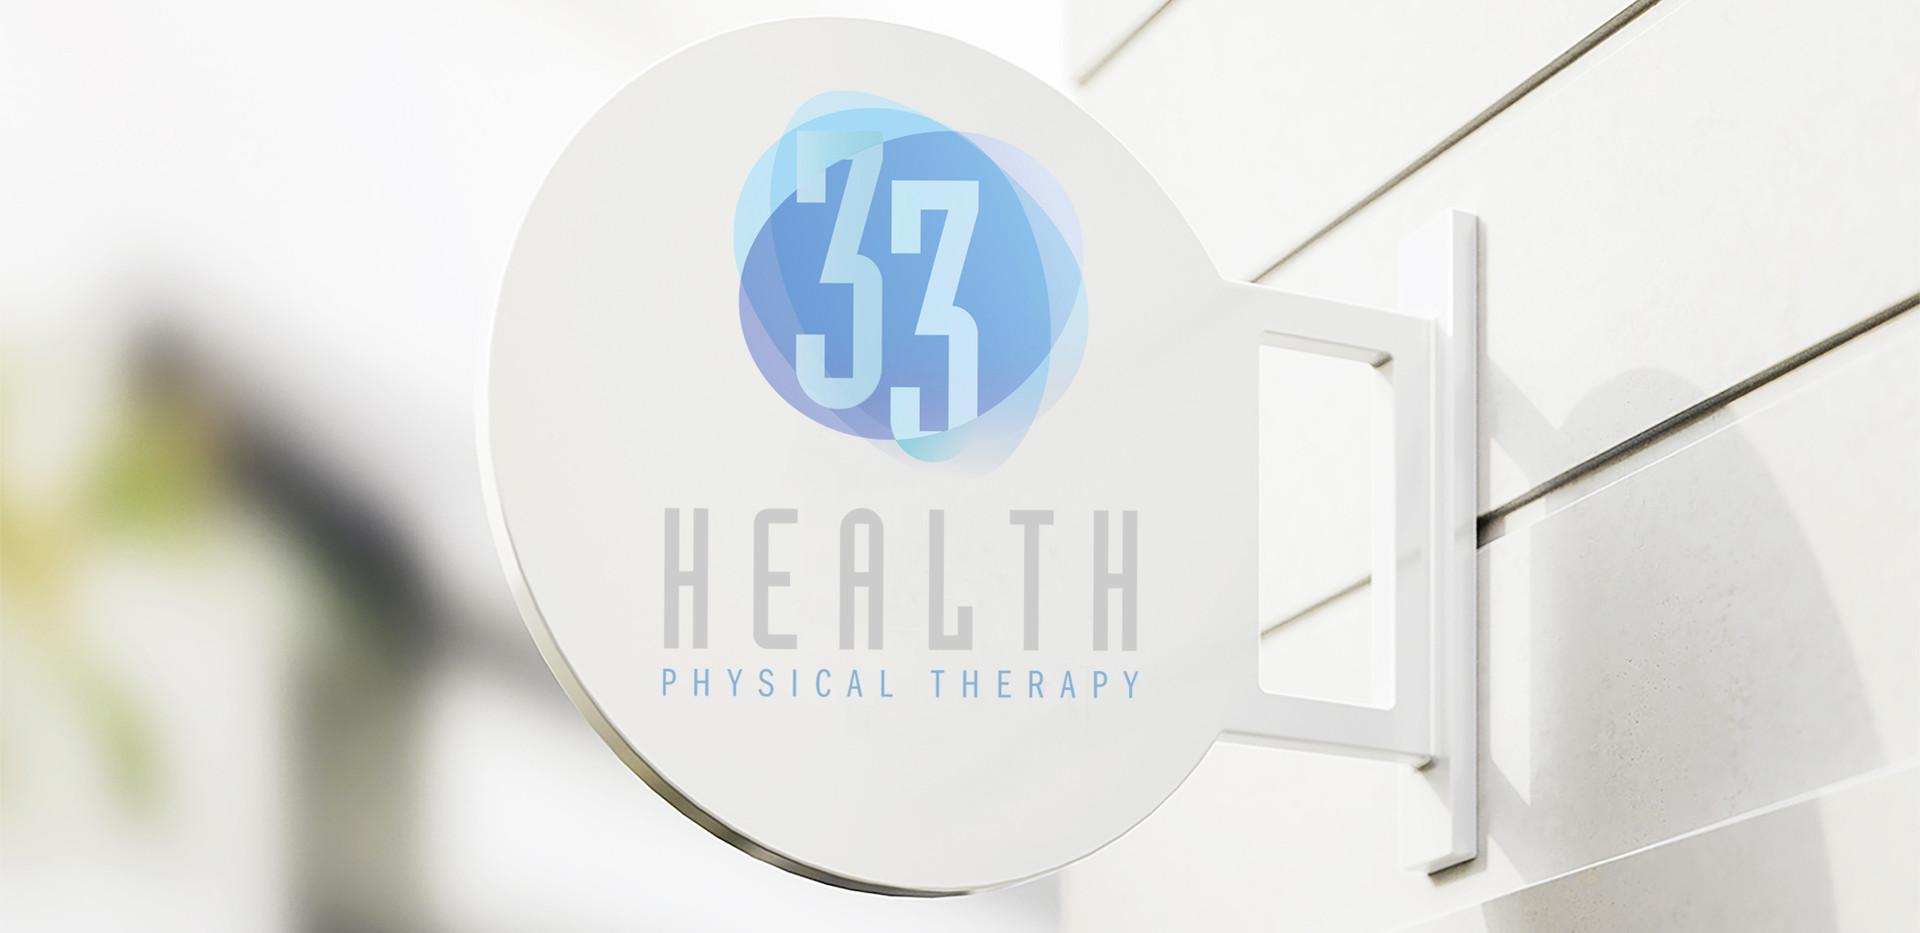 33_Health_SignLogo.jpg